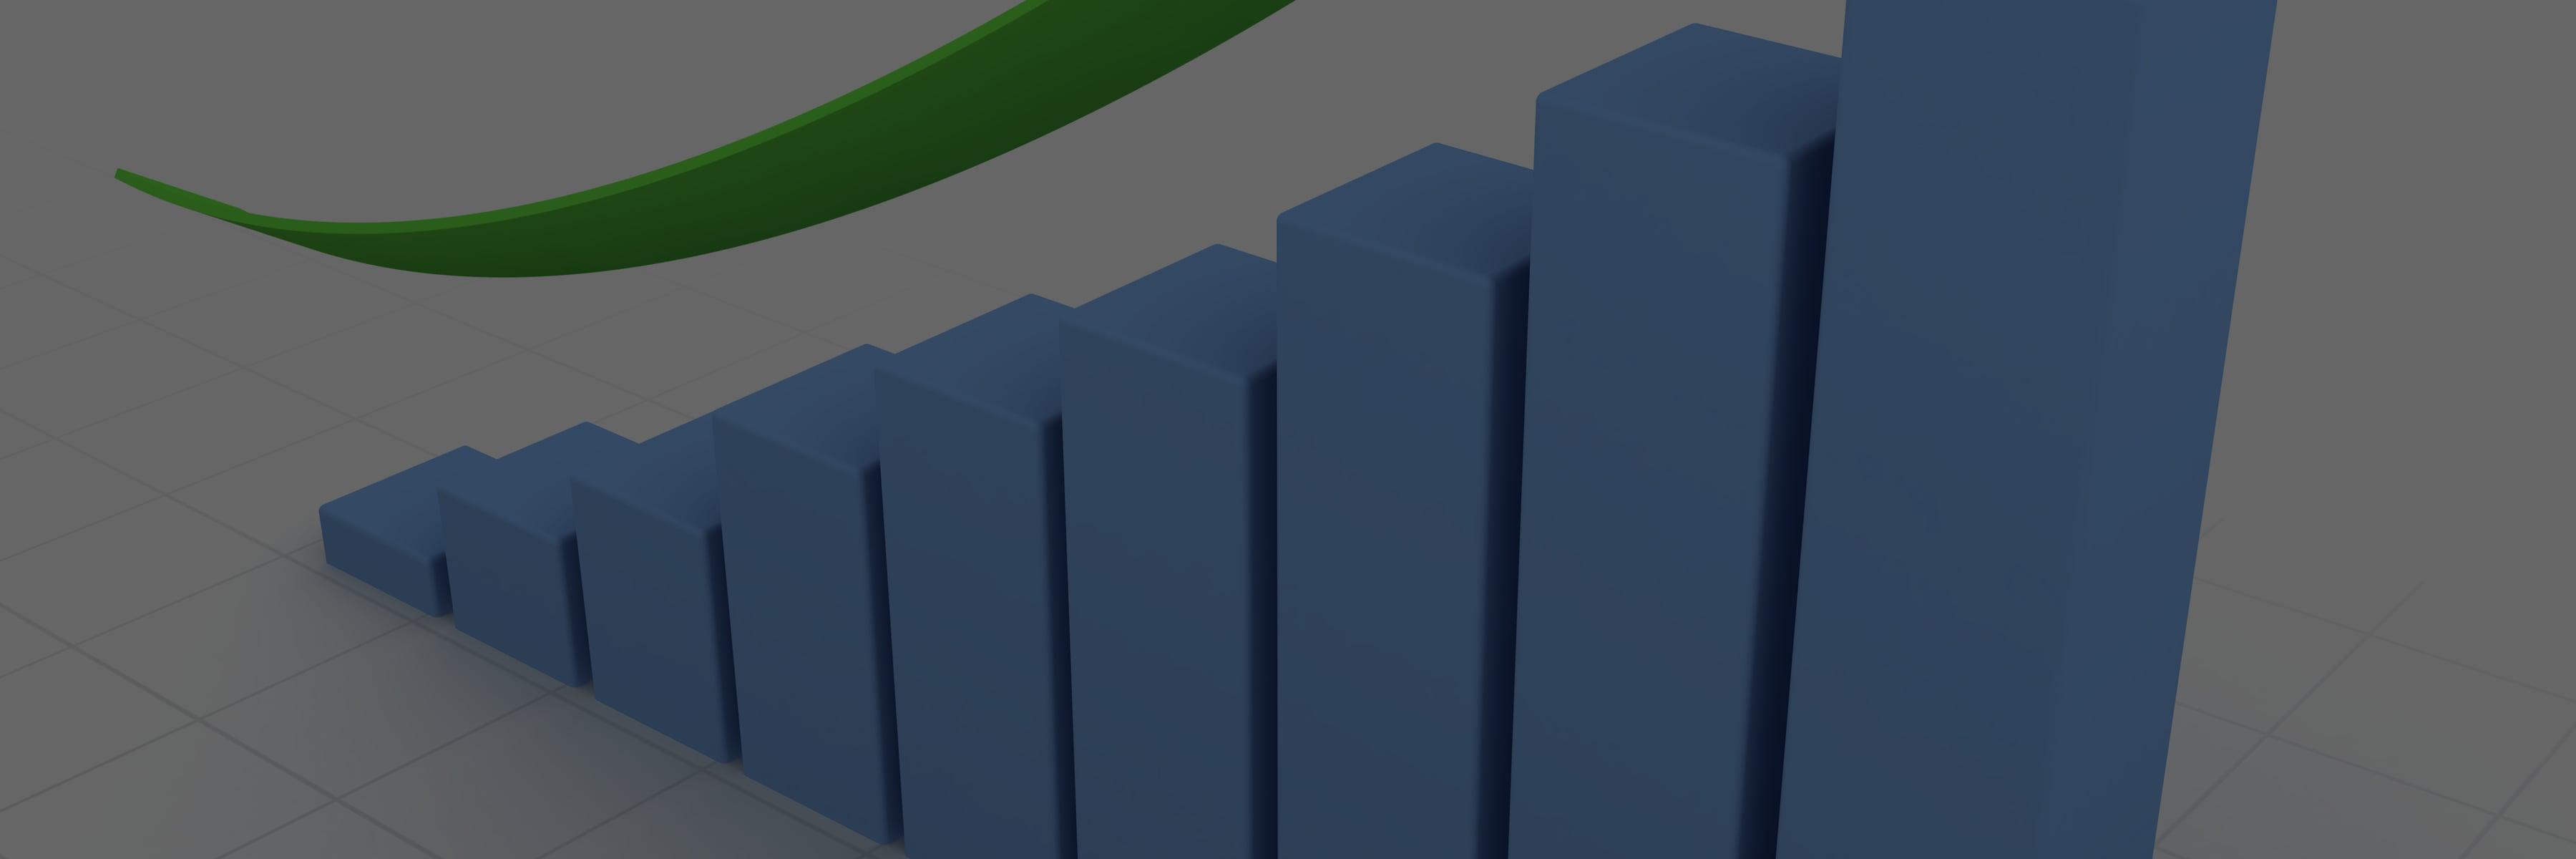 naem-webinar-2013-leveraging-actionable-leading-indicators-drive-improved-safety-performance-1800x600-min